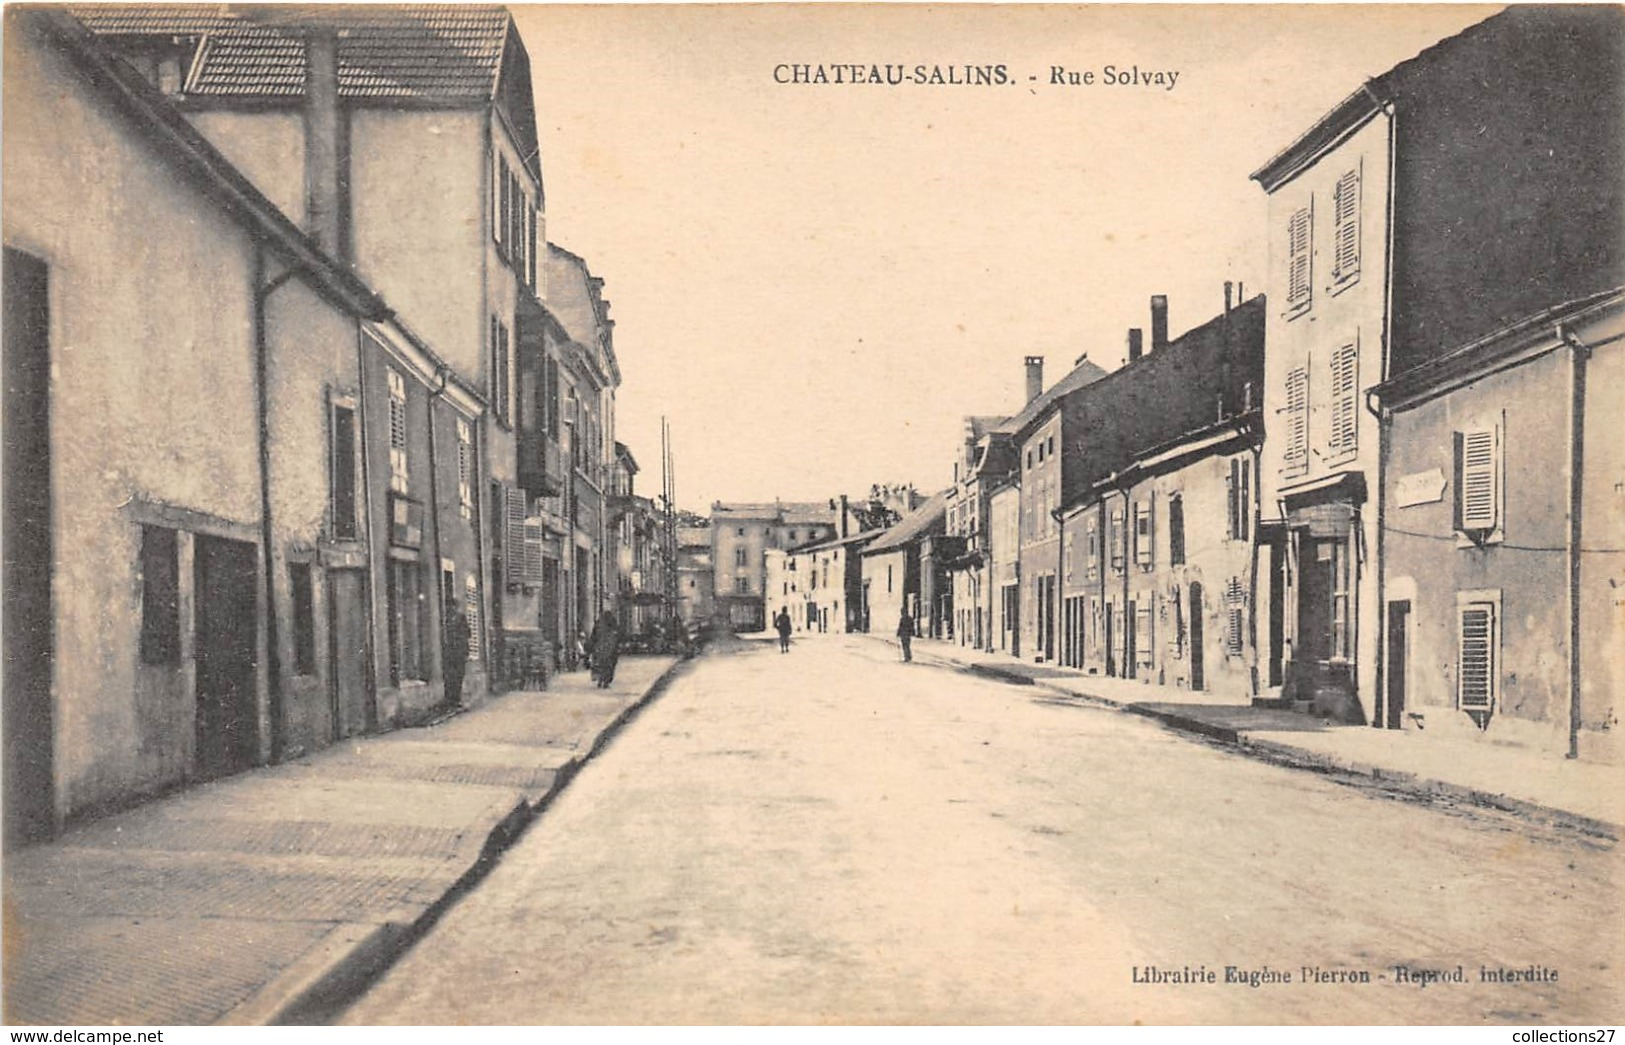 57-CHATEAU-SALINS- RUE SOLVAY - Chateau Salins